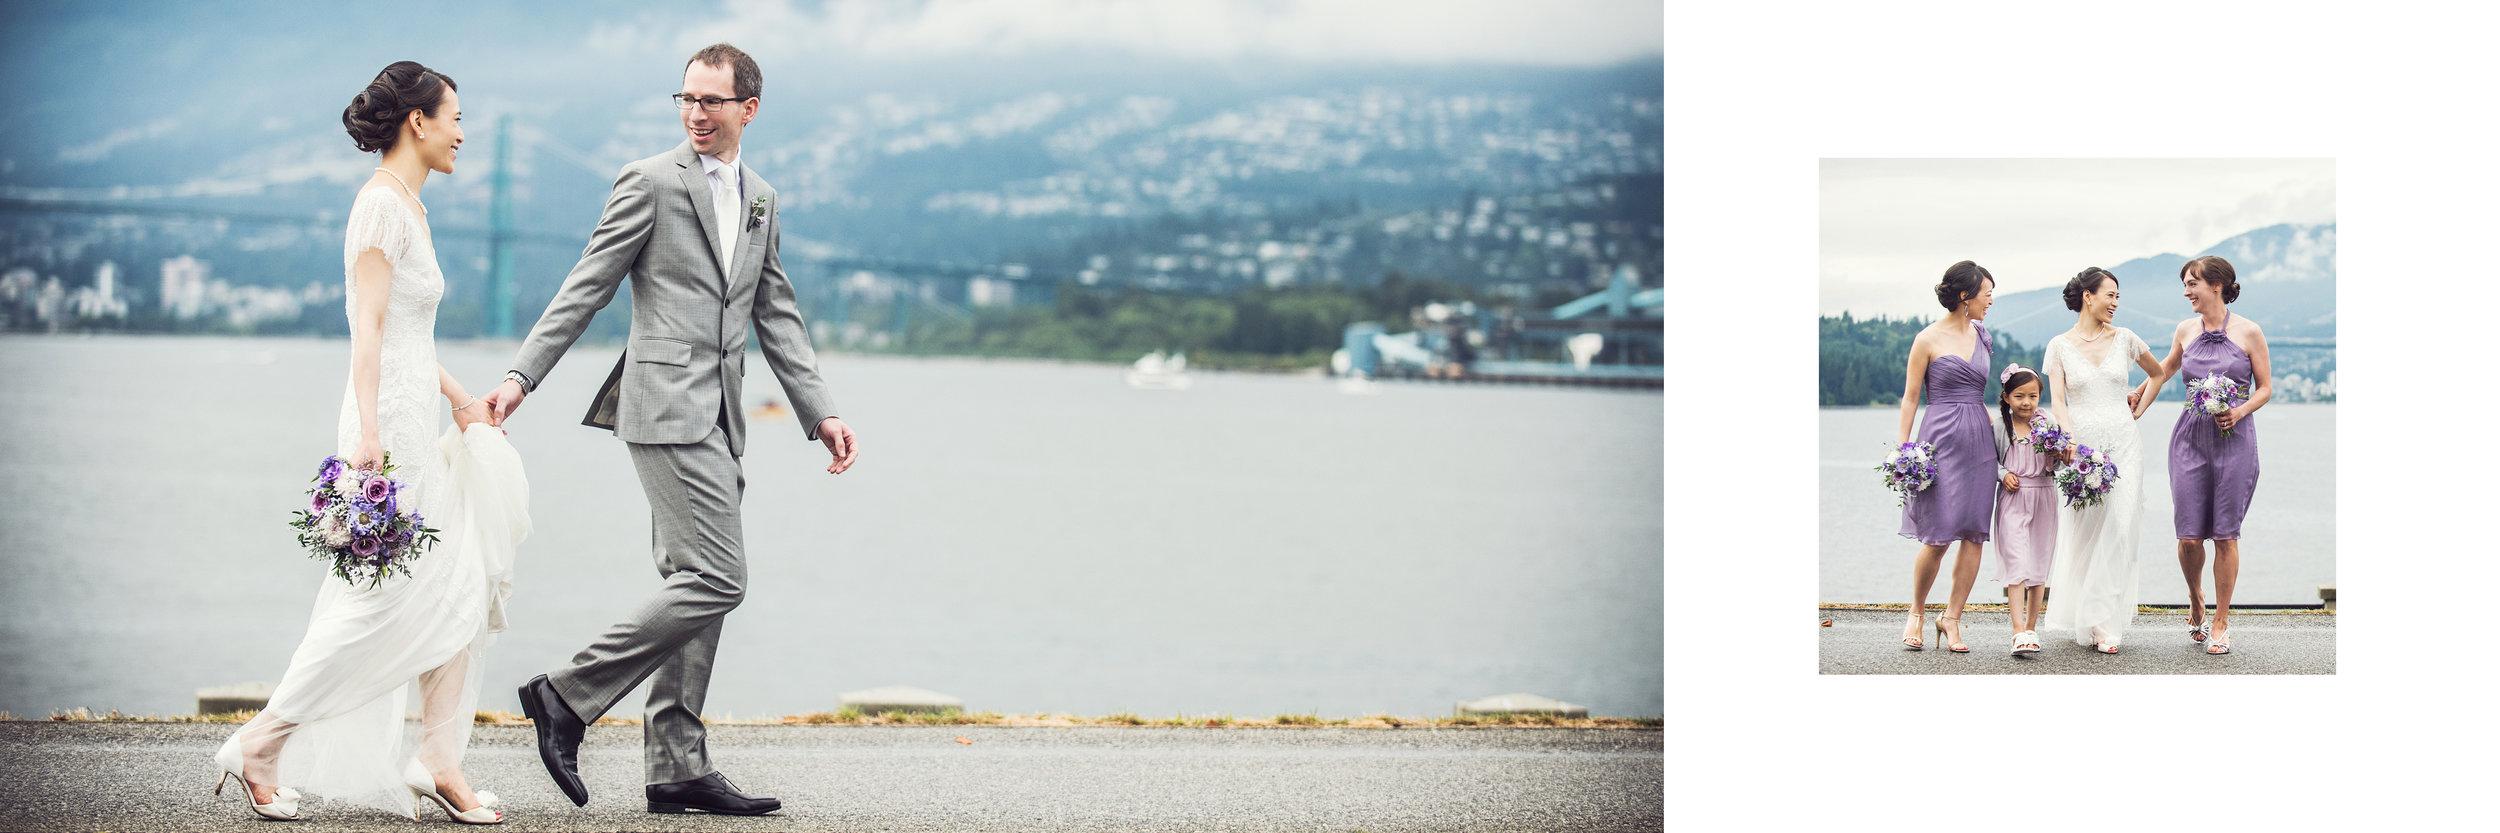 Andrea-Reuben-Grouse-Mountain-Wedding-Real-Weddings-Feature-Yaletown-Photography-009.jpg